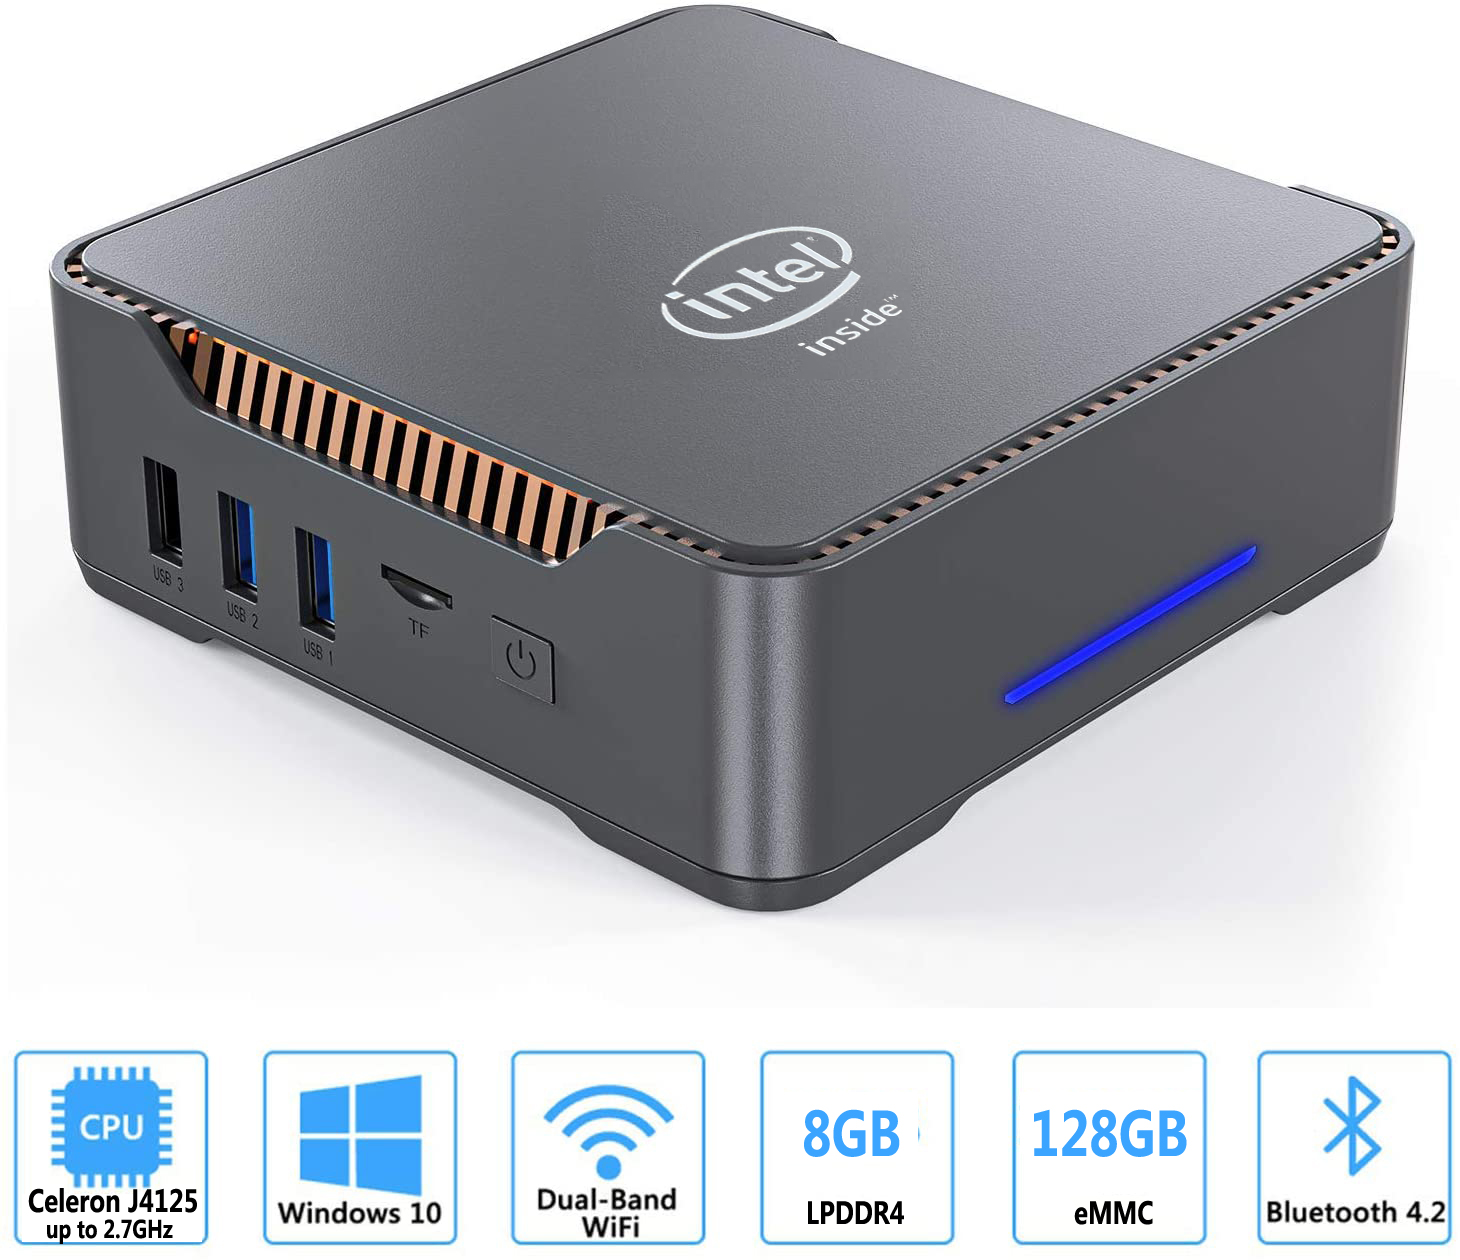 GK3V Windows 10 Мини ПК Intel Gemini Lake J4125 8 Гб DDR4 128 ГБ 256 512 1 ТБ SSD консоль для ПК-игр с поддержкой Windows 2,4G 5G Wi-Fi 1000 м для мини-компьютера